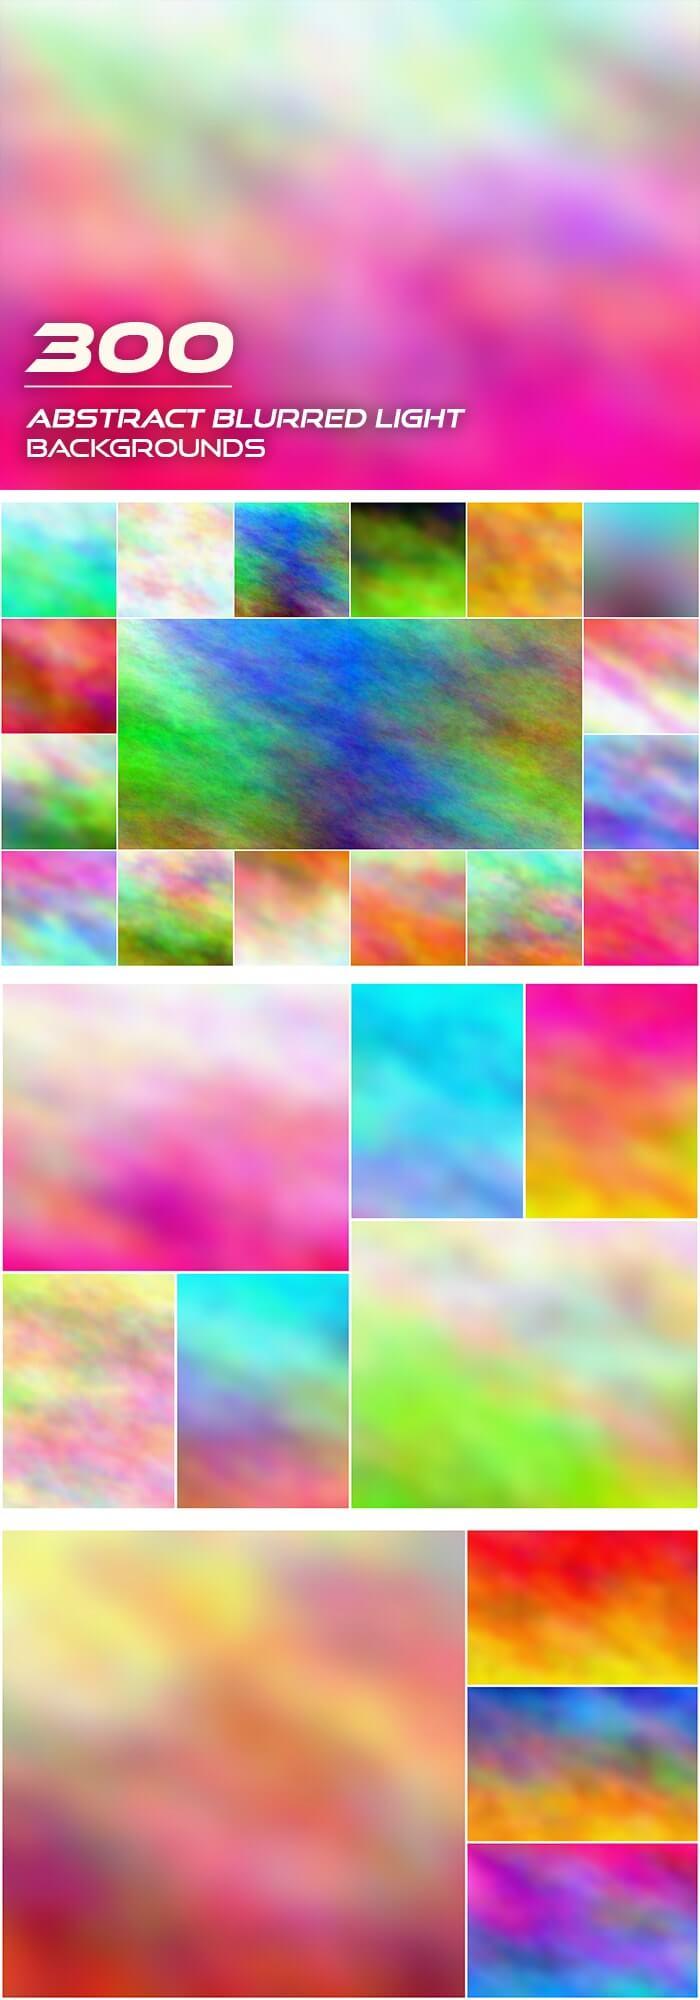 2000+ High Resolution Digital Backgrounds Bundle - $29 - 300 Abstract Blurred Light Backgrounds